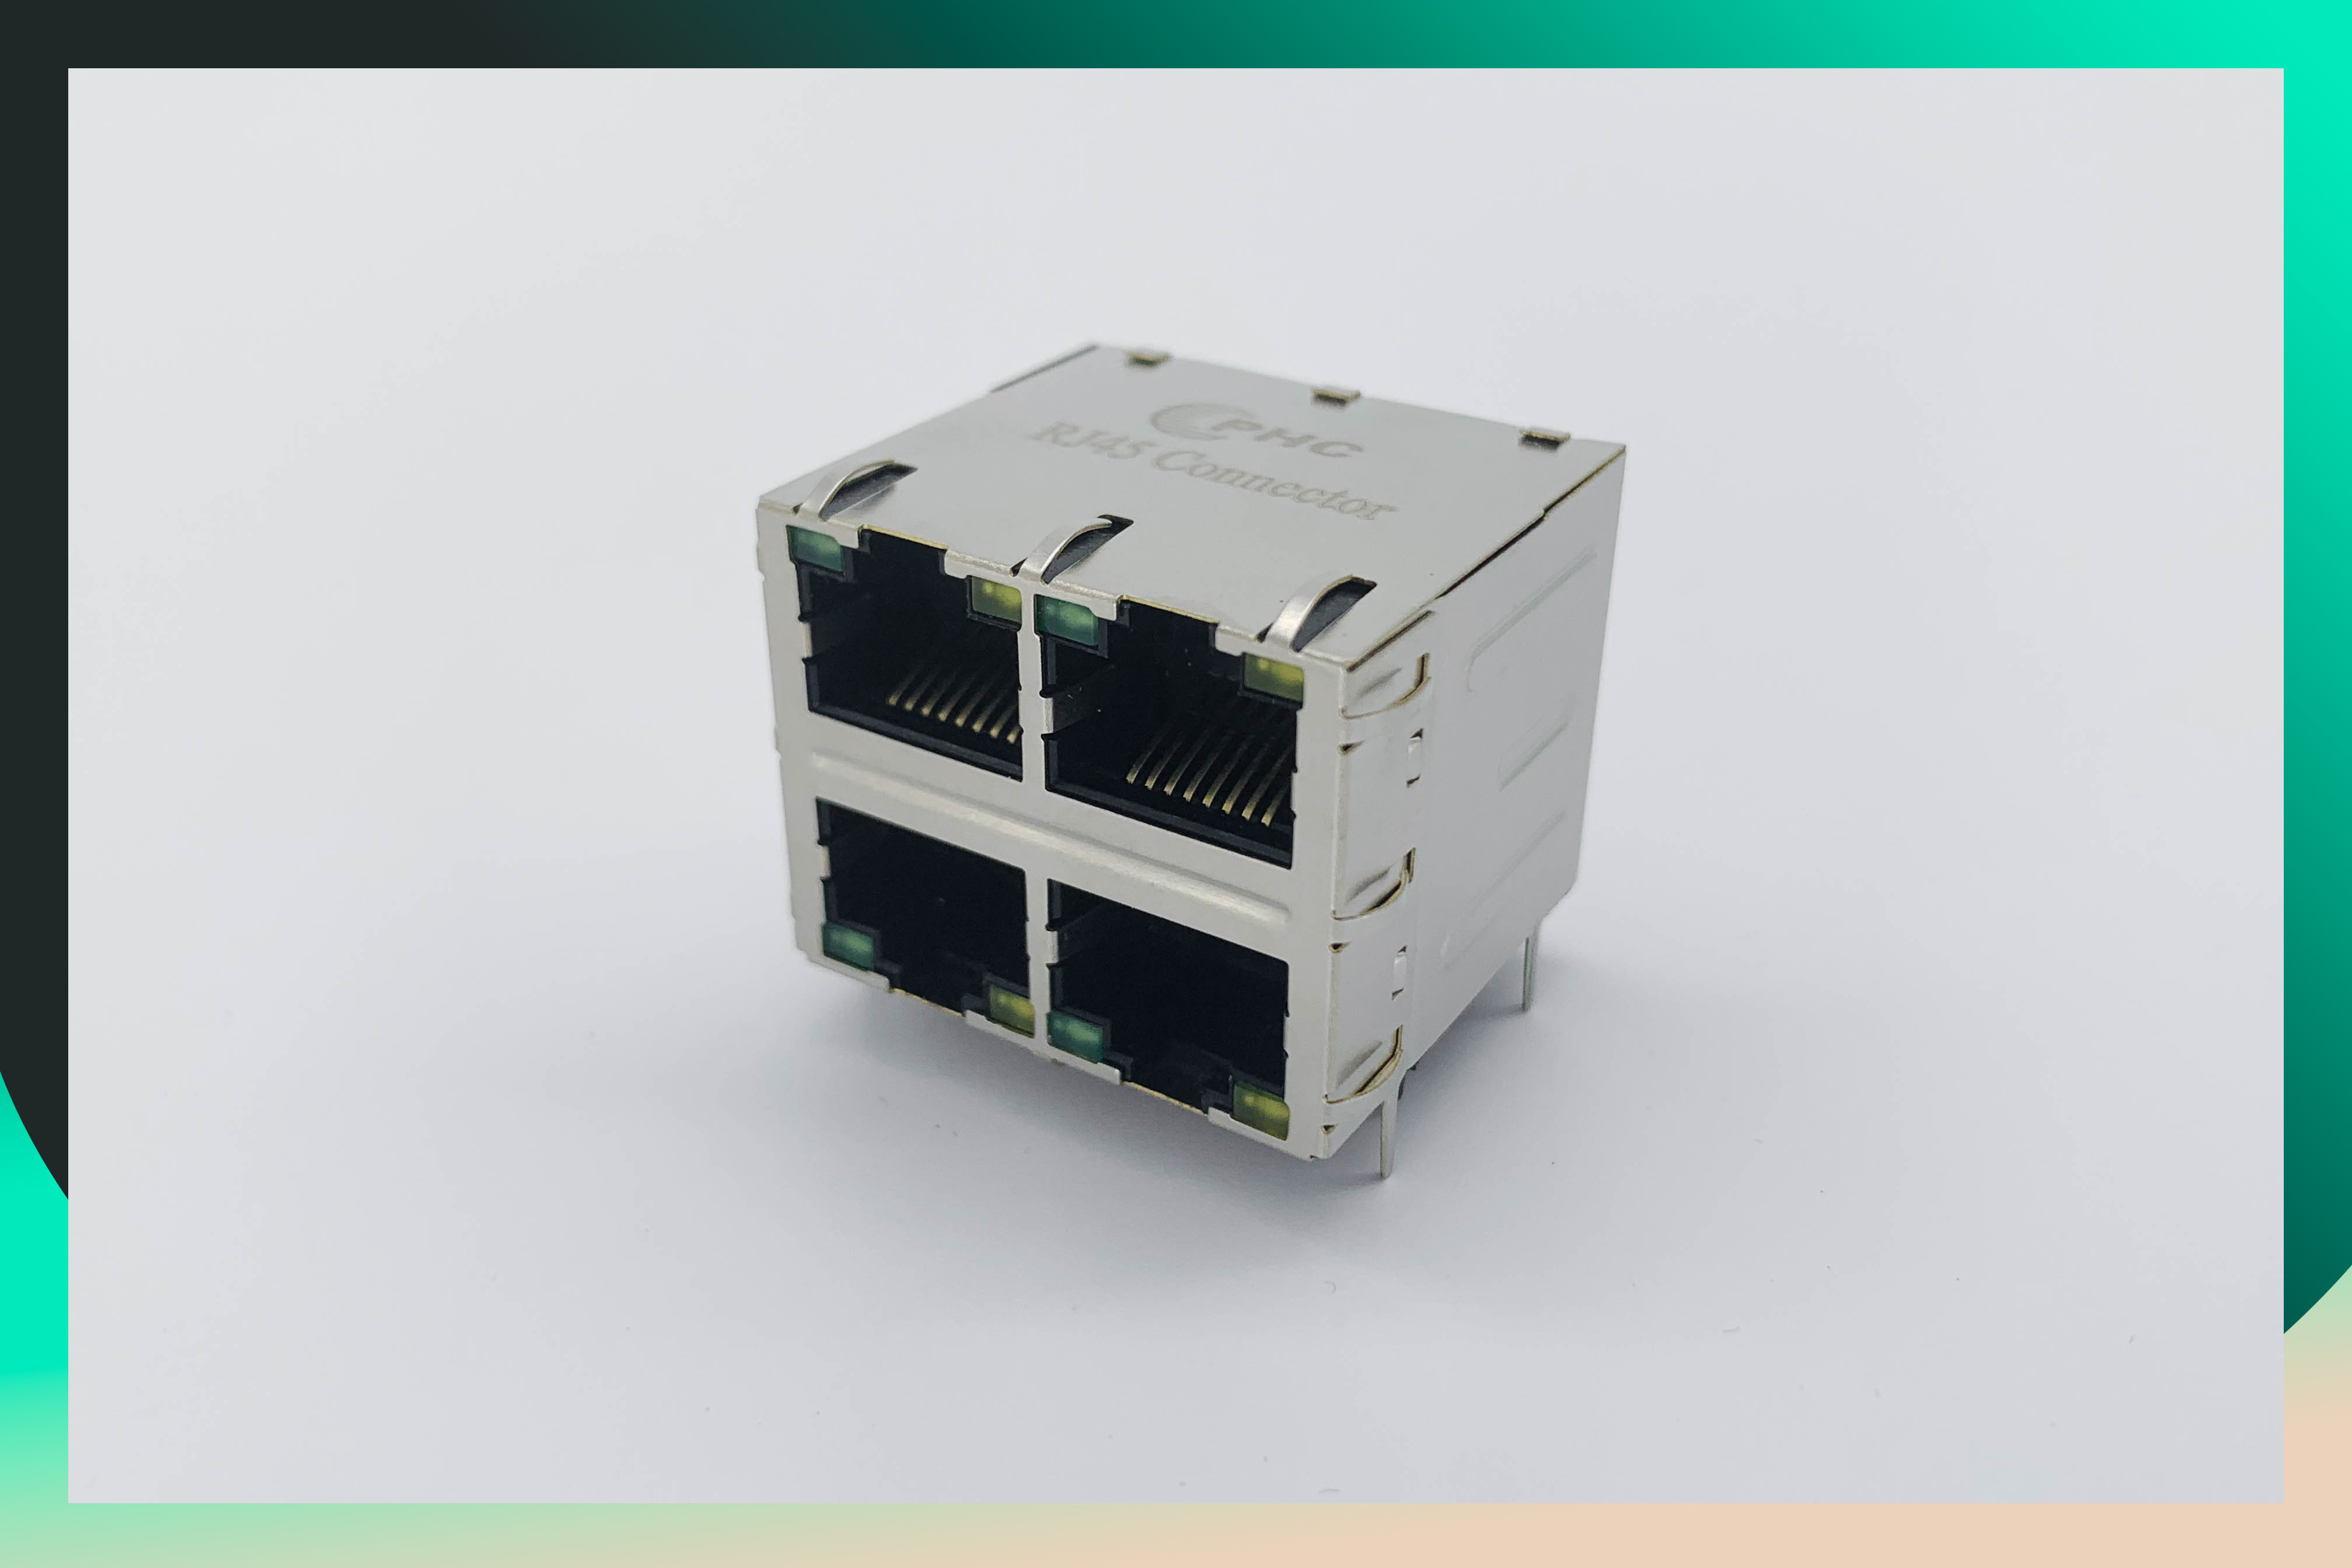 Phc 2 X 2 Port 10 100 Mbps Shielded Rj45 Ethernet